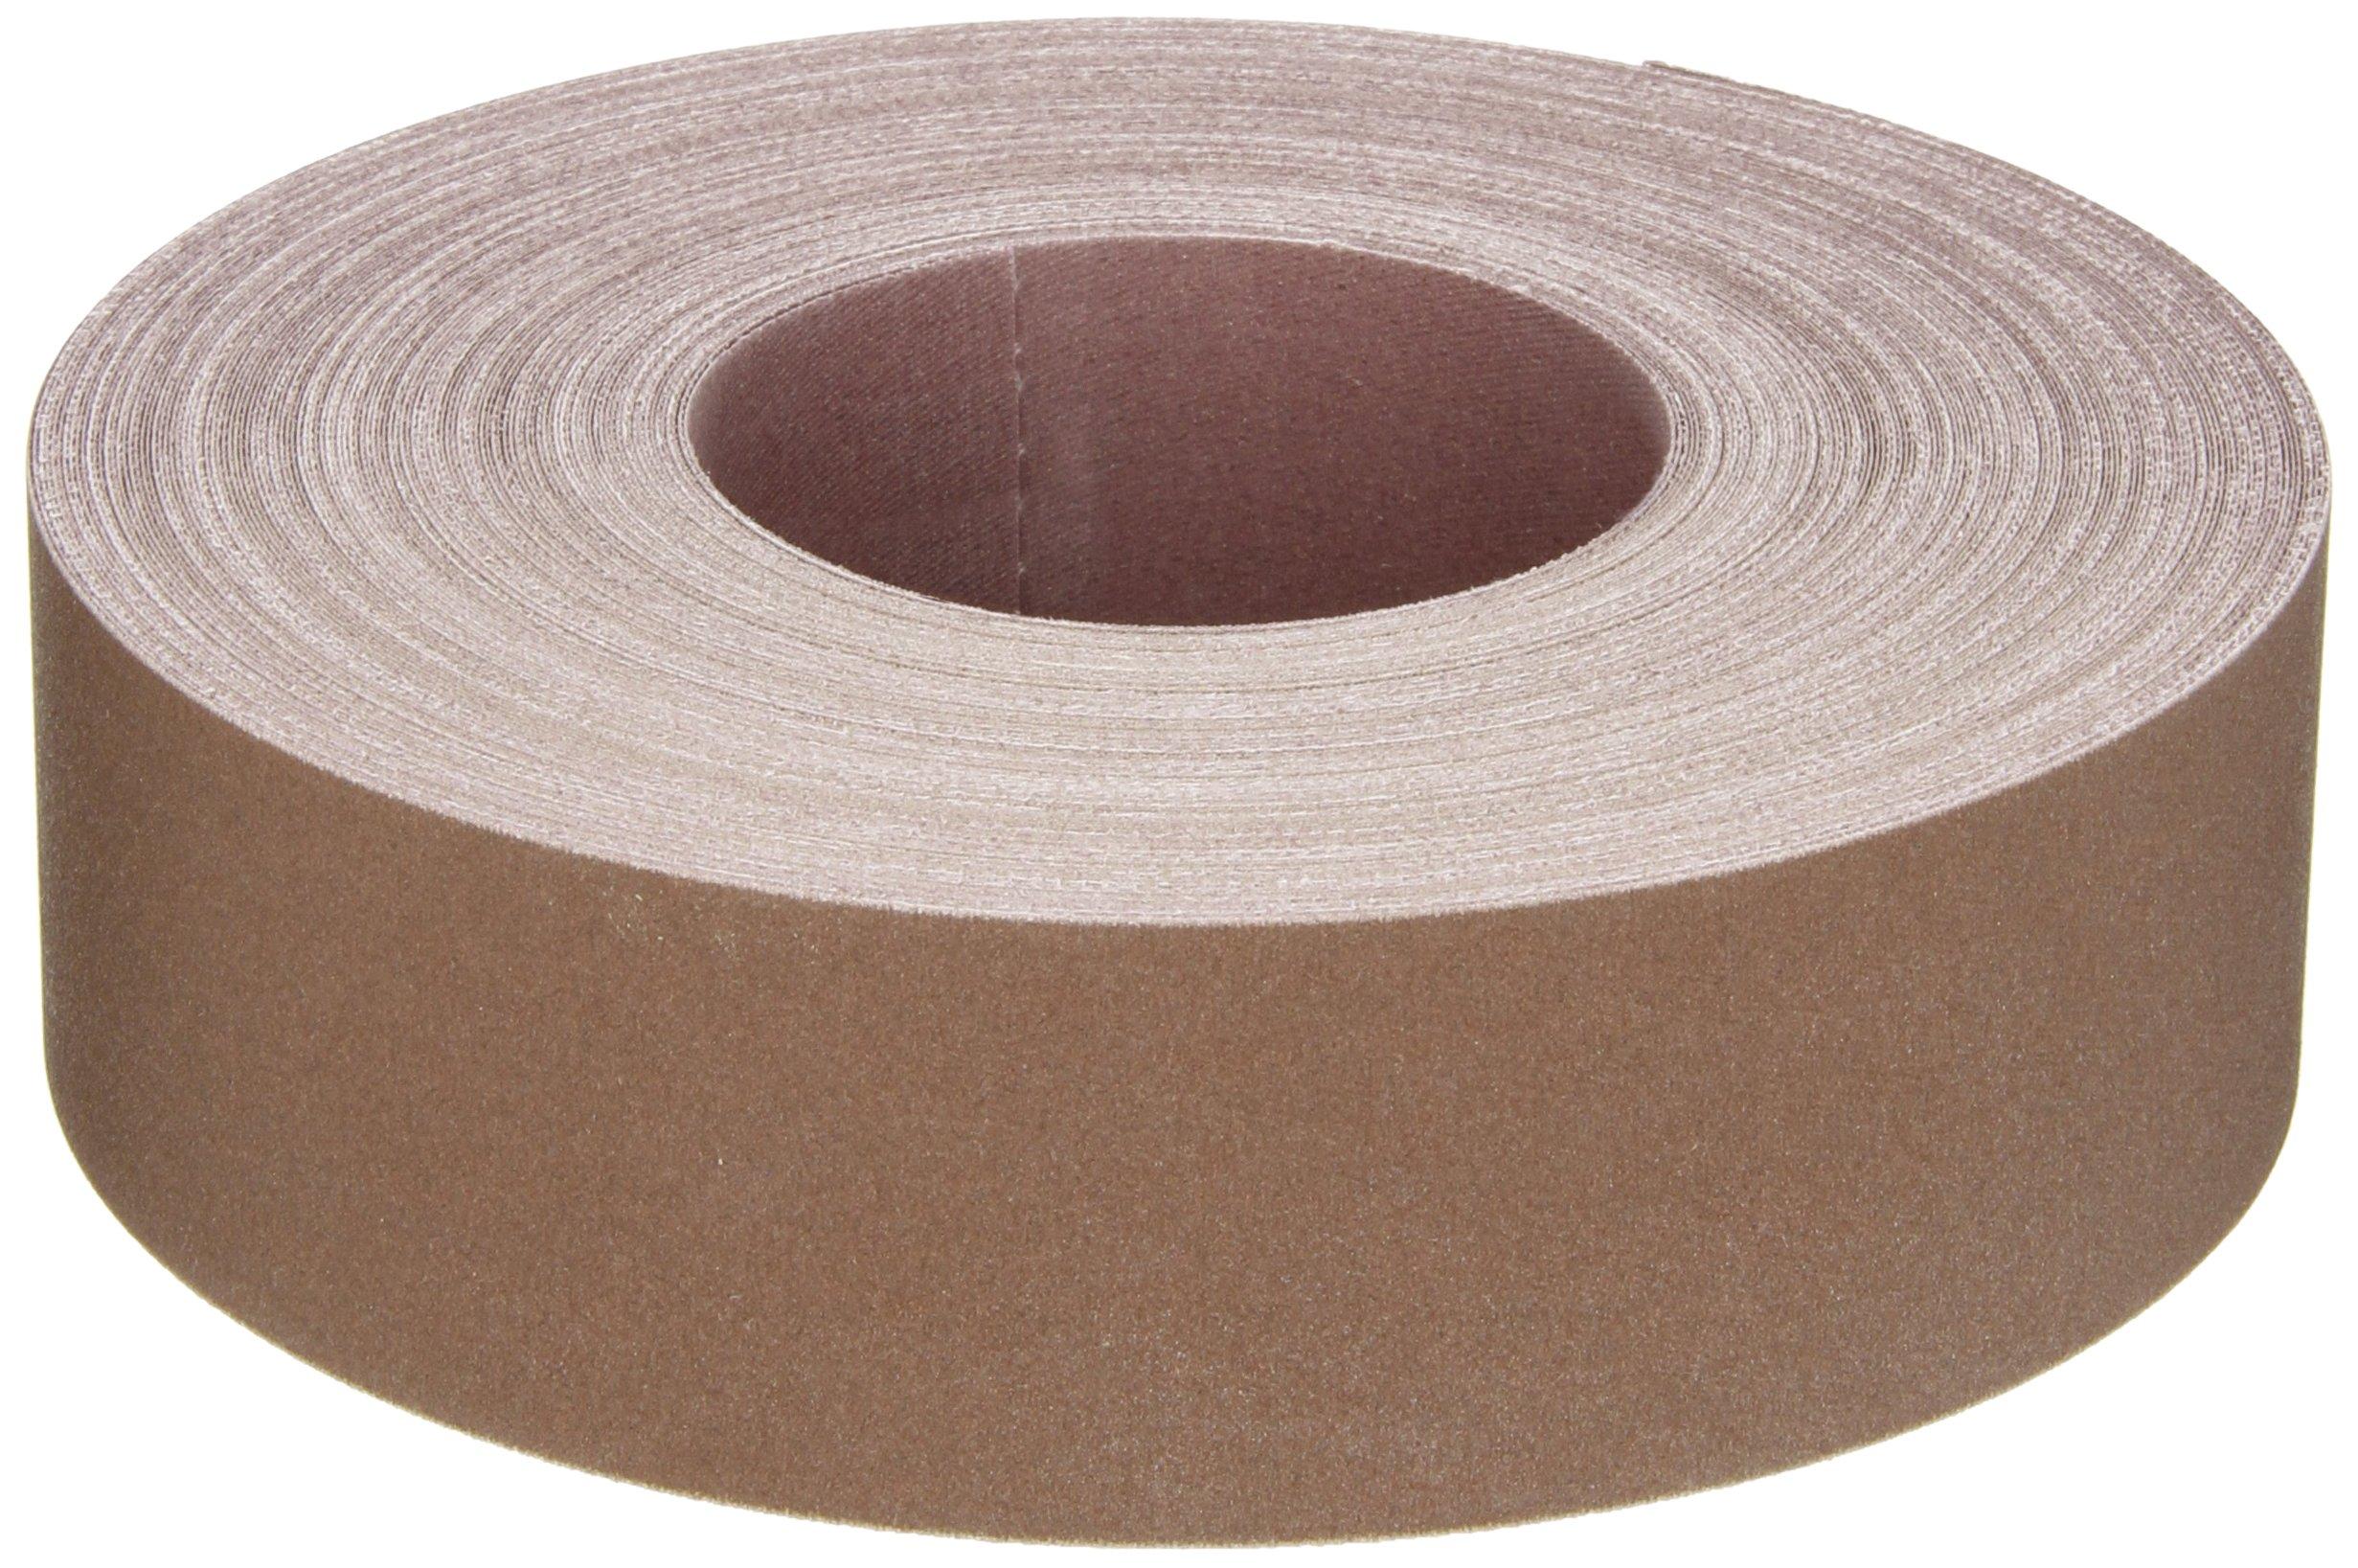 Norton K225 Metalite Abrasive Roll, Cloth Backing, Aluminum Oxide, 2'' Width x 50yd Length, Grit P320